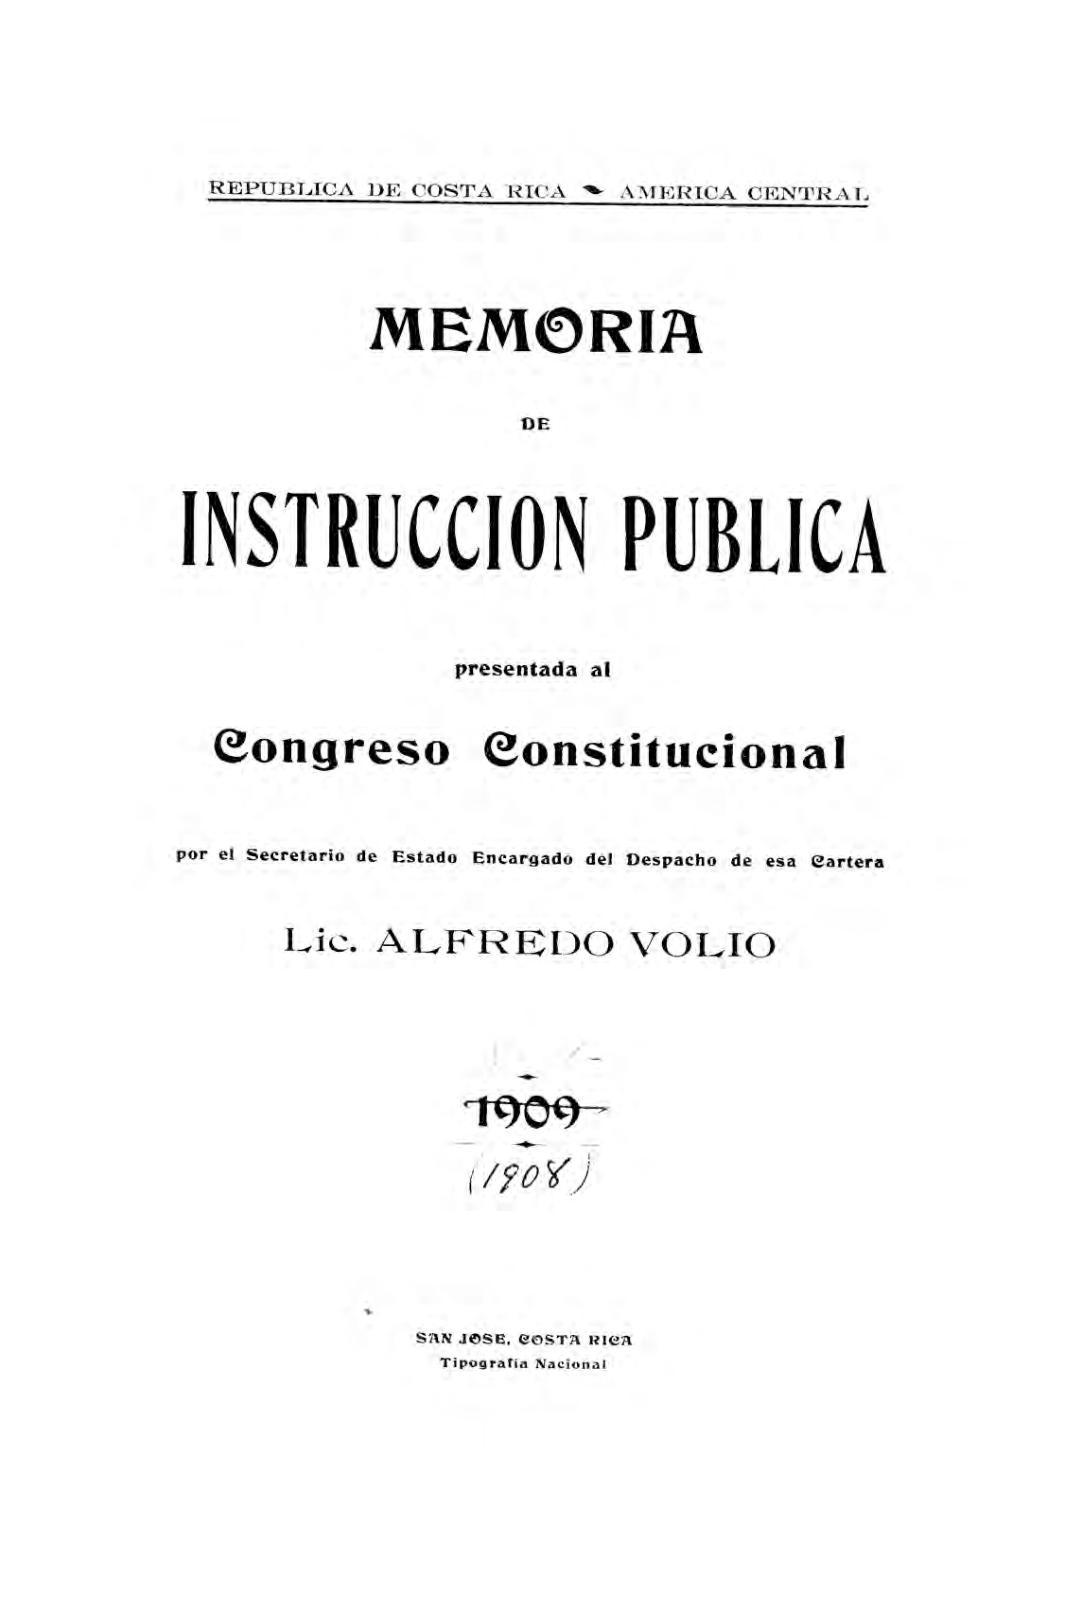 cbfa4fd0d708 Calaméo - Memoria1908